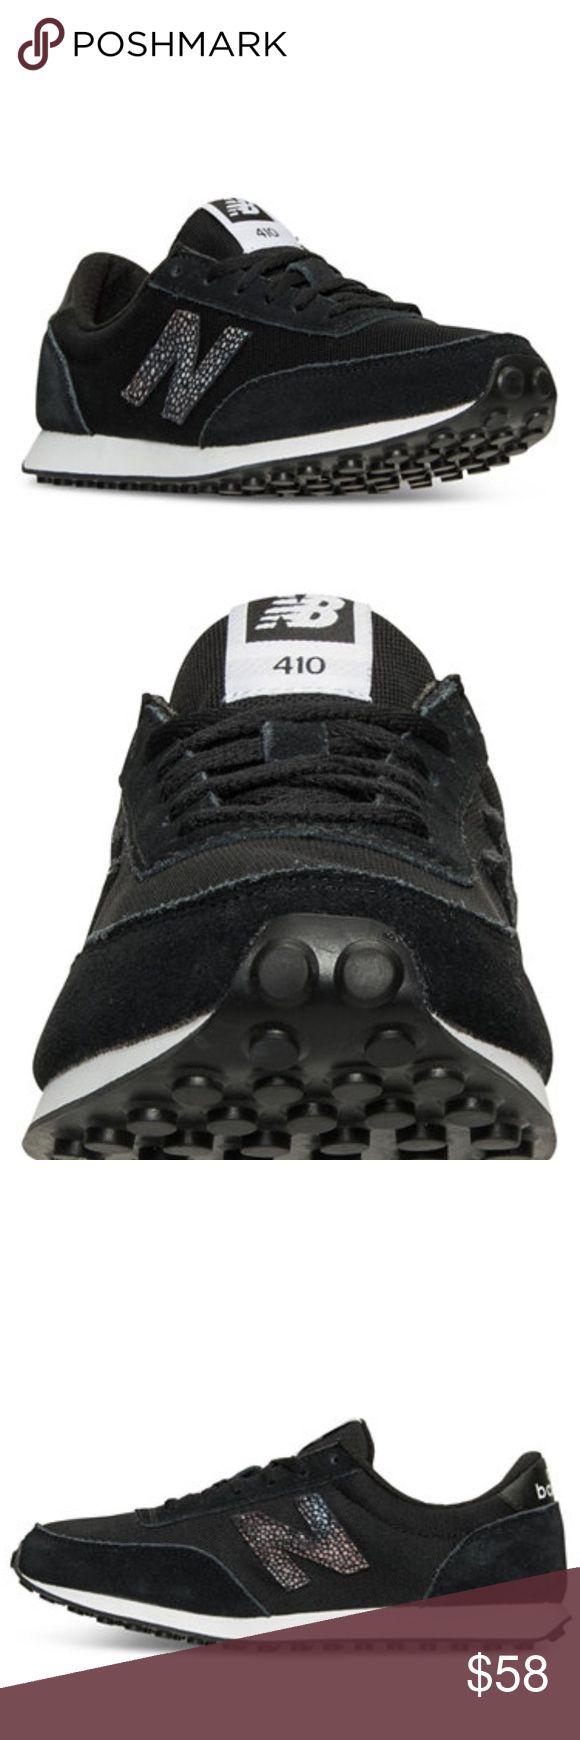 NIB New Balance Women's Black 410 Causal Sneakers NIB New Balance Women's 410 Causal Sneakers / Color Black / Size 6 / 6.5 / 7 / 8 available New Balance Shoes Sneakers